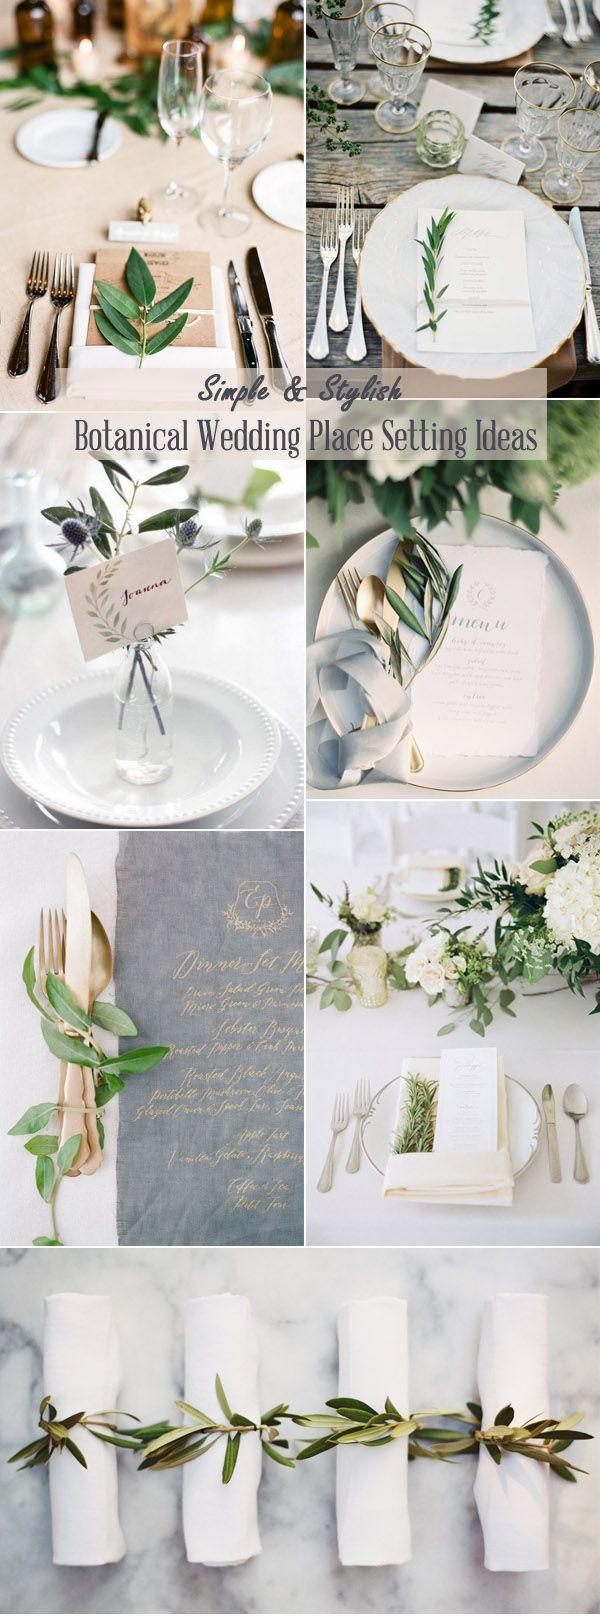 2017 TrendsEasy Diy Organic Minimalist Wedding Ideas Wedding